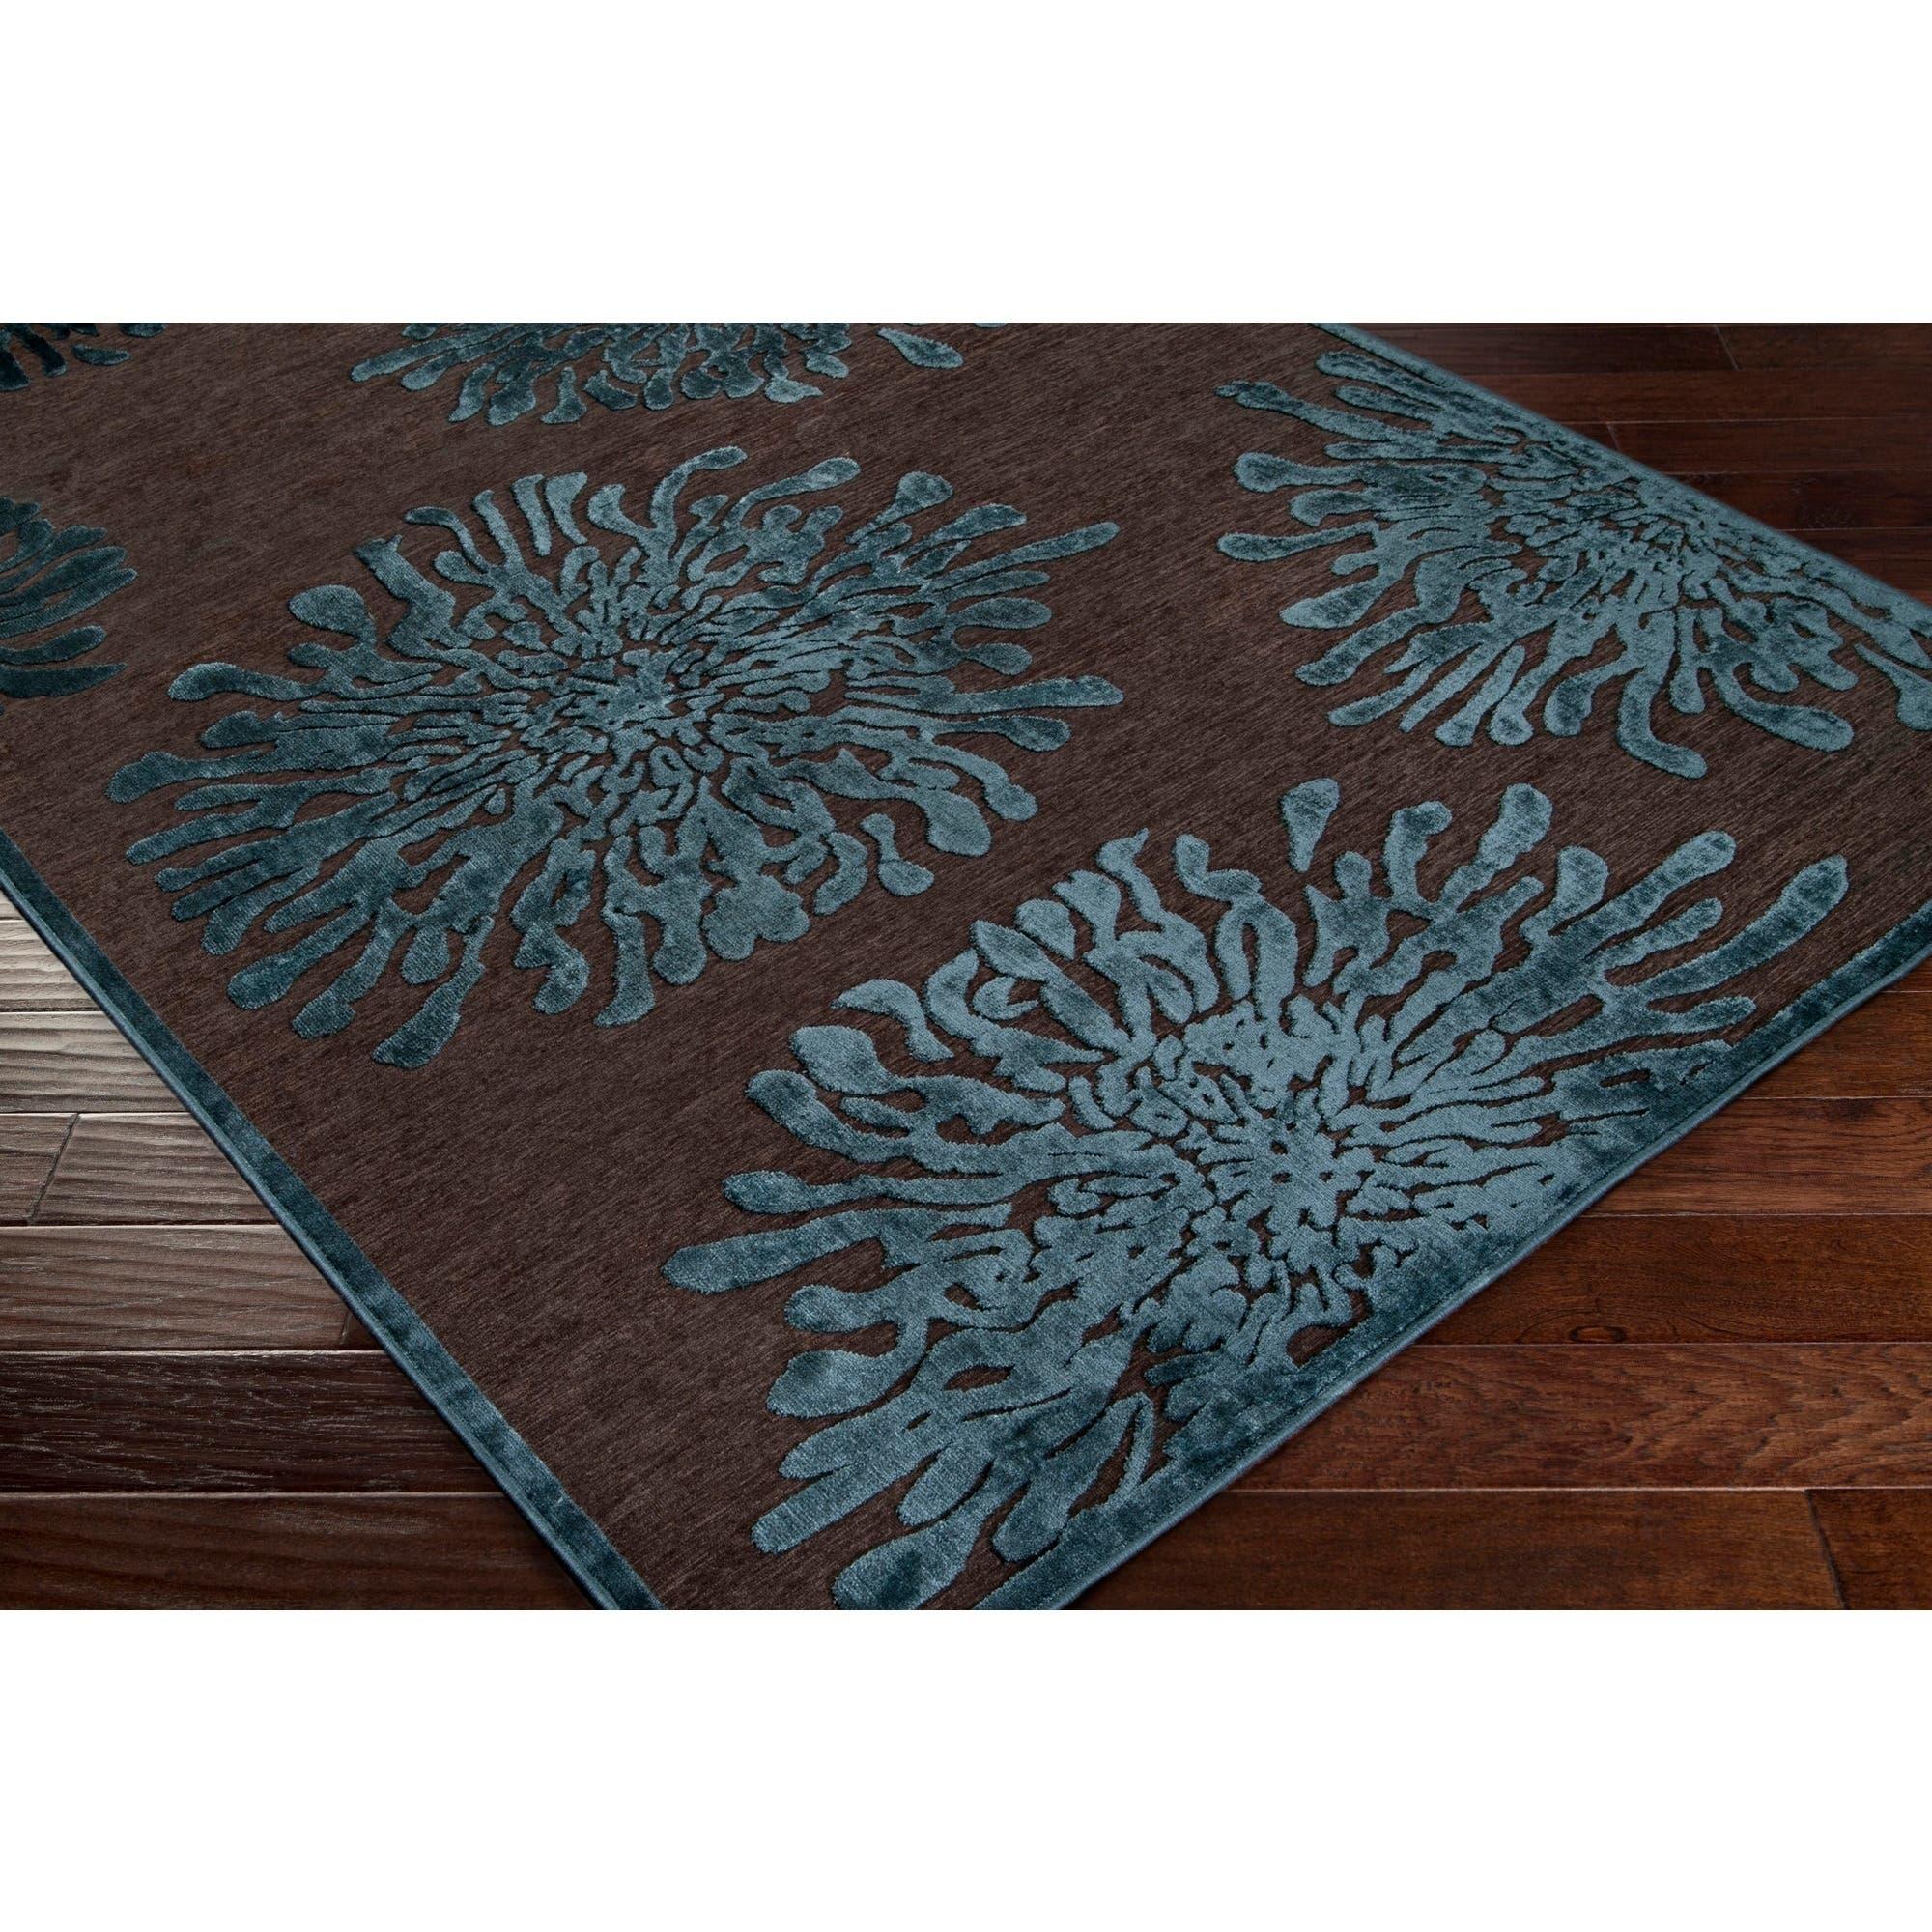 Buy 7x9 - 10x14 Rugs Online At Overstock.com